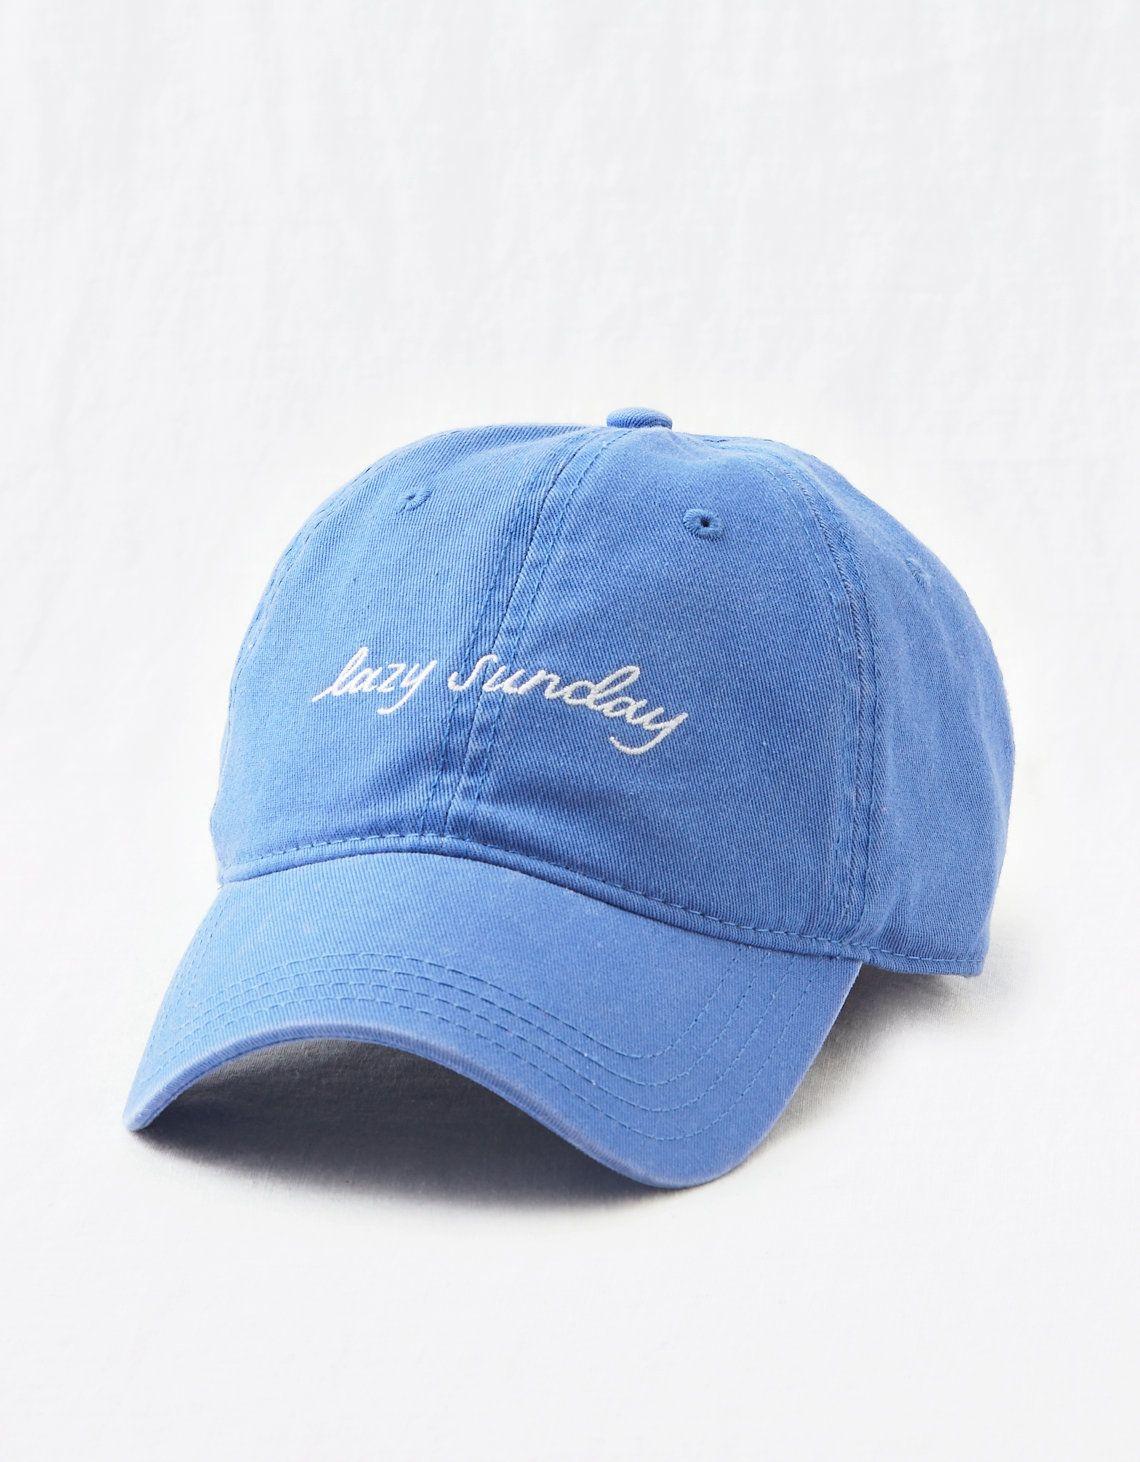 Aerie Baseball Hat in 2019 Baseball hats, Hats, Sweaters